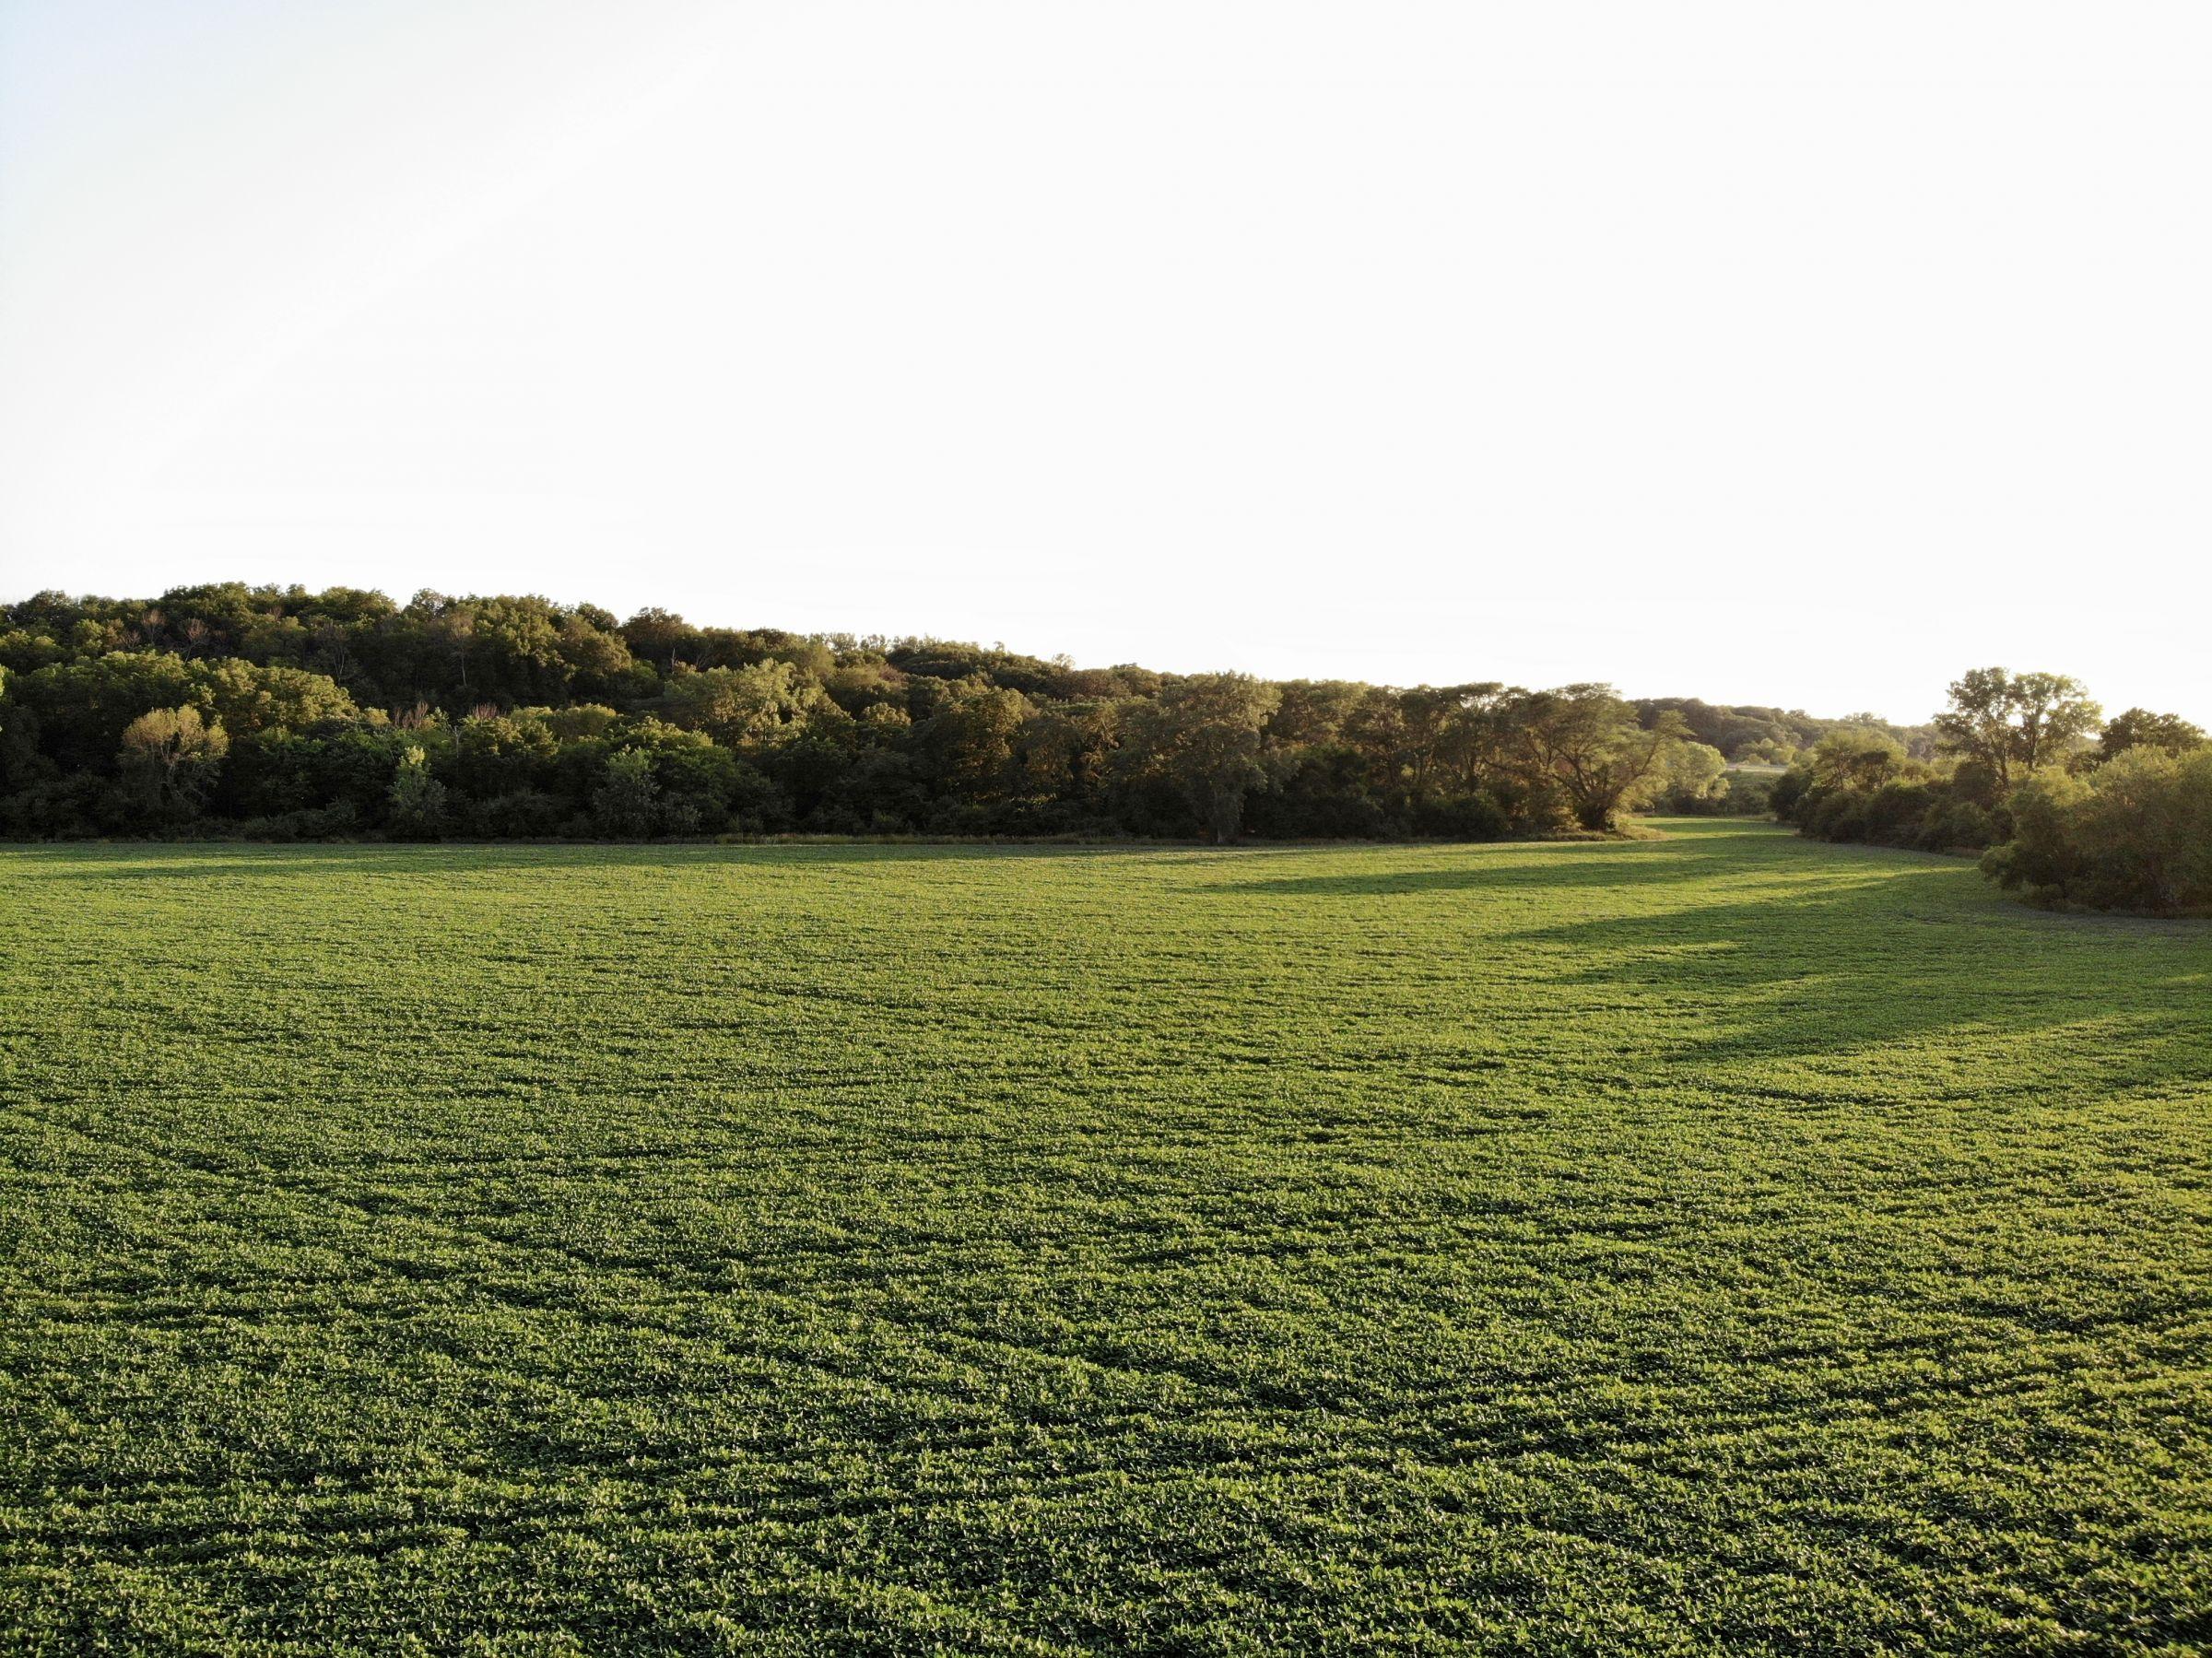 land-polk-county-iowa-89-acres-listing-number-15626-6-2021-07-09-142617.jpg